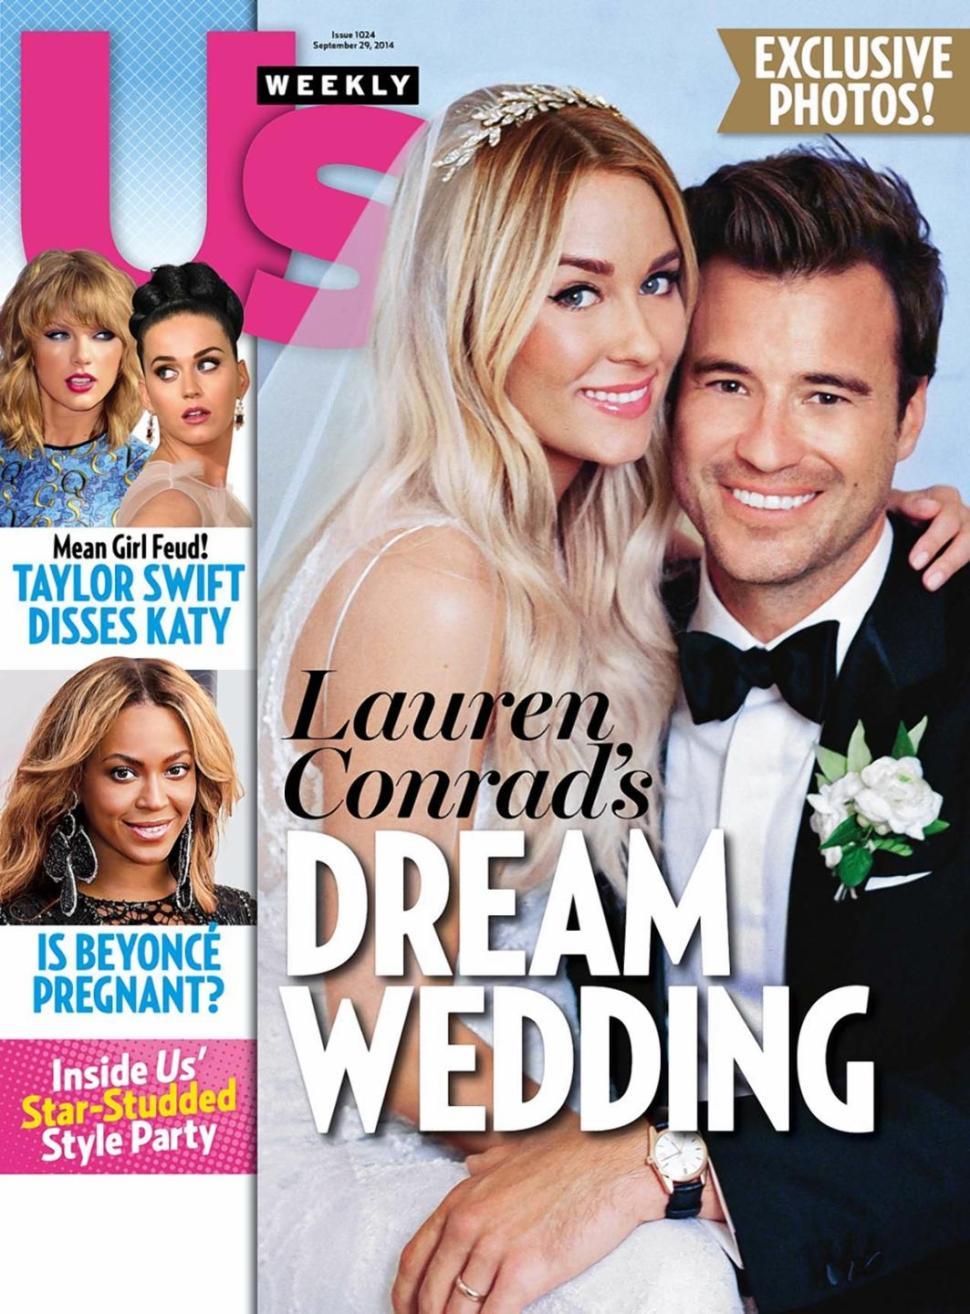 Lauren and william wedding